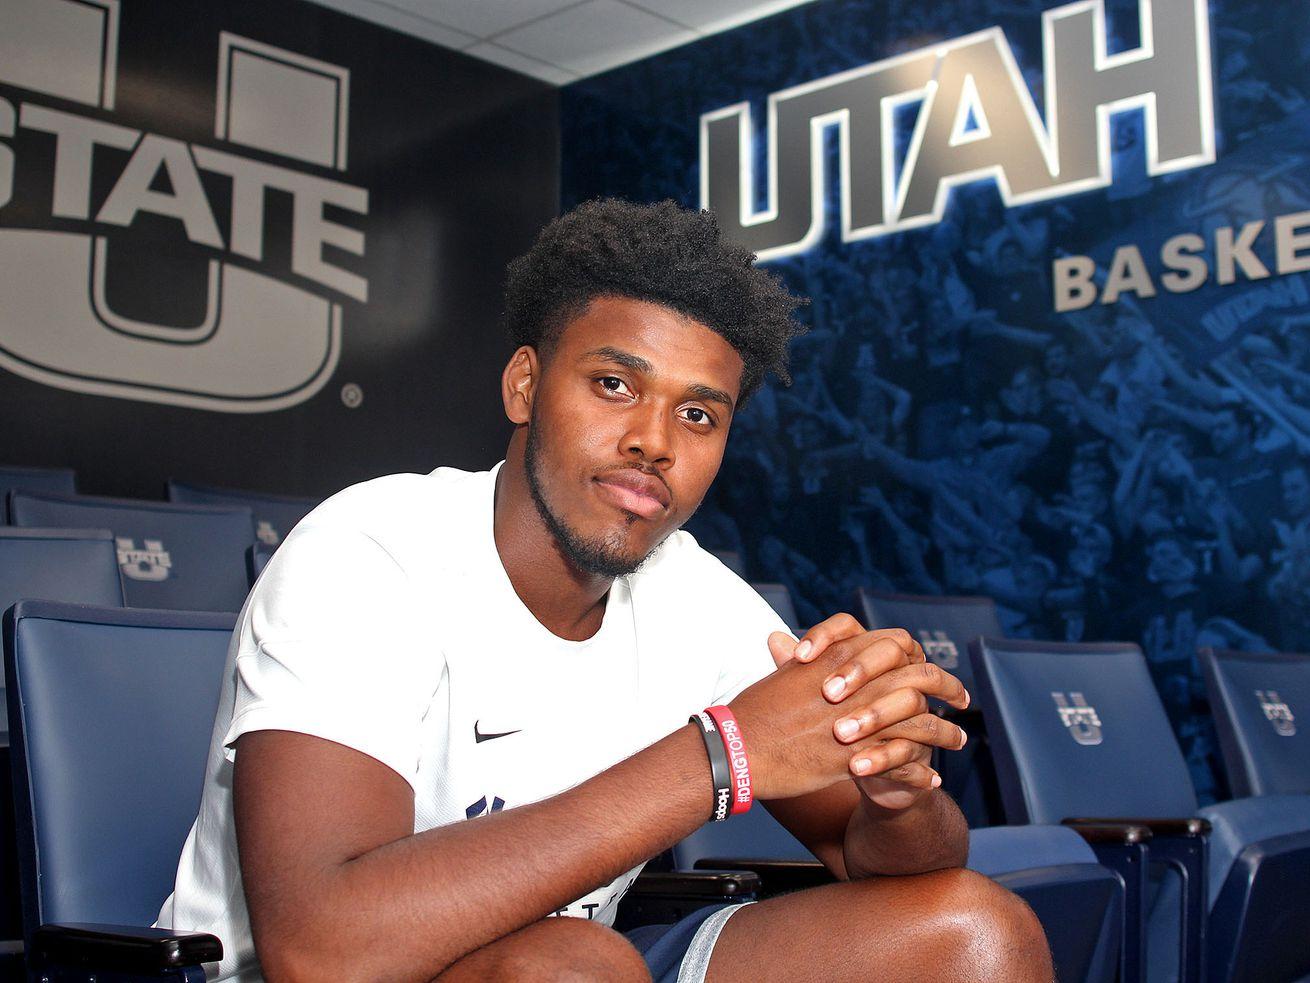 Guard RJ Eytle-Rock led UMBC in scoring last season at 14.3 points per game before transferring to Utah State.